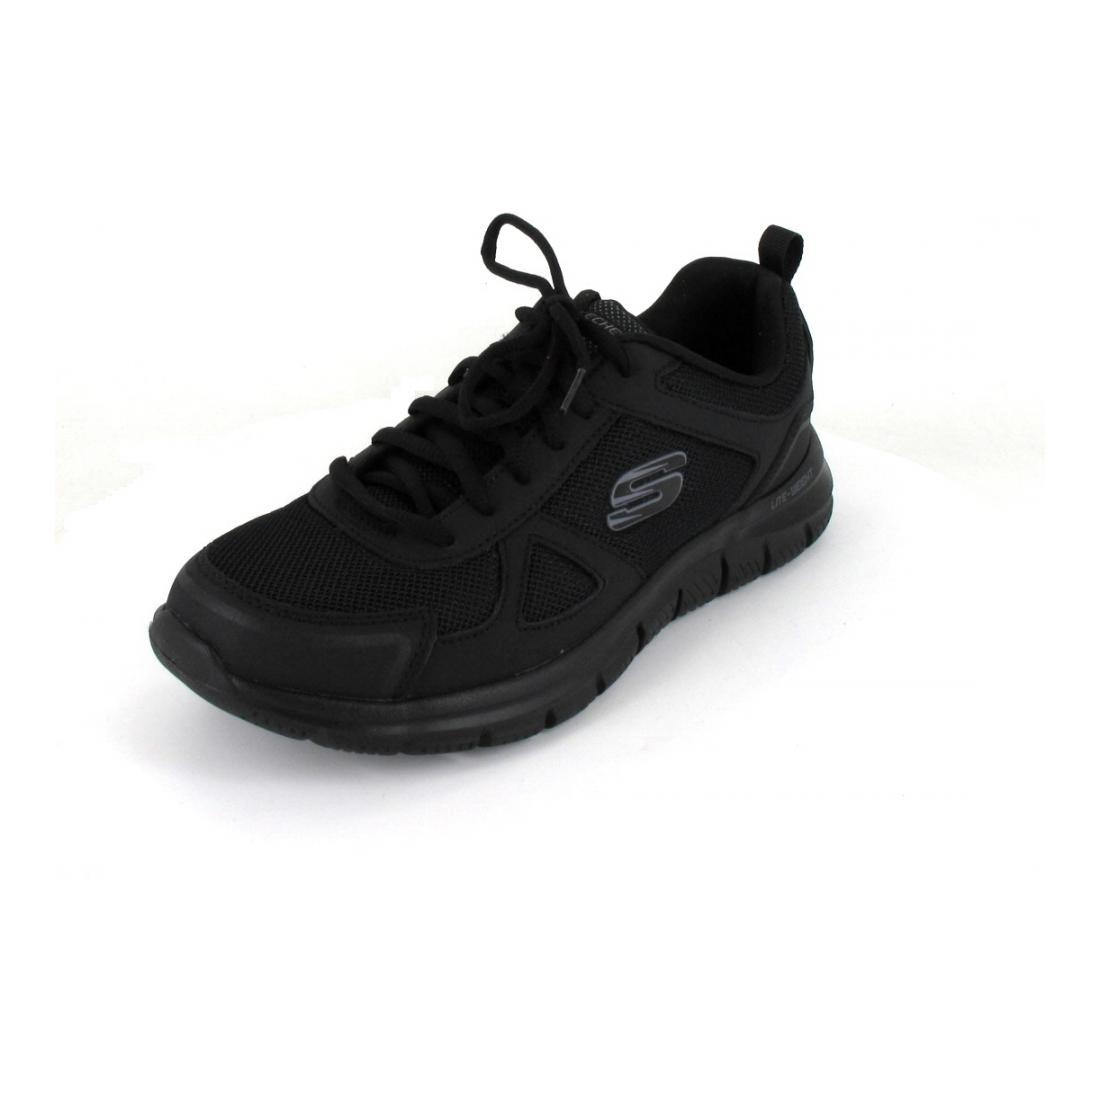 Skechers Sneaker BBK